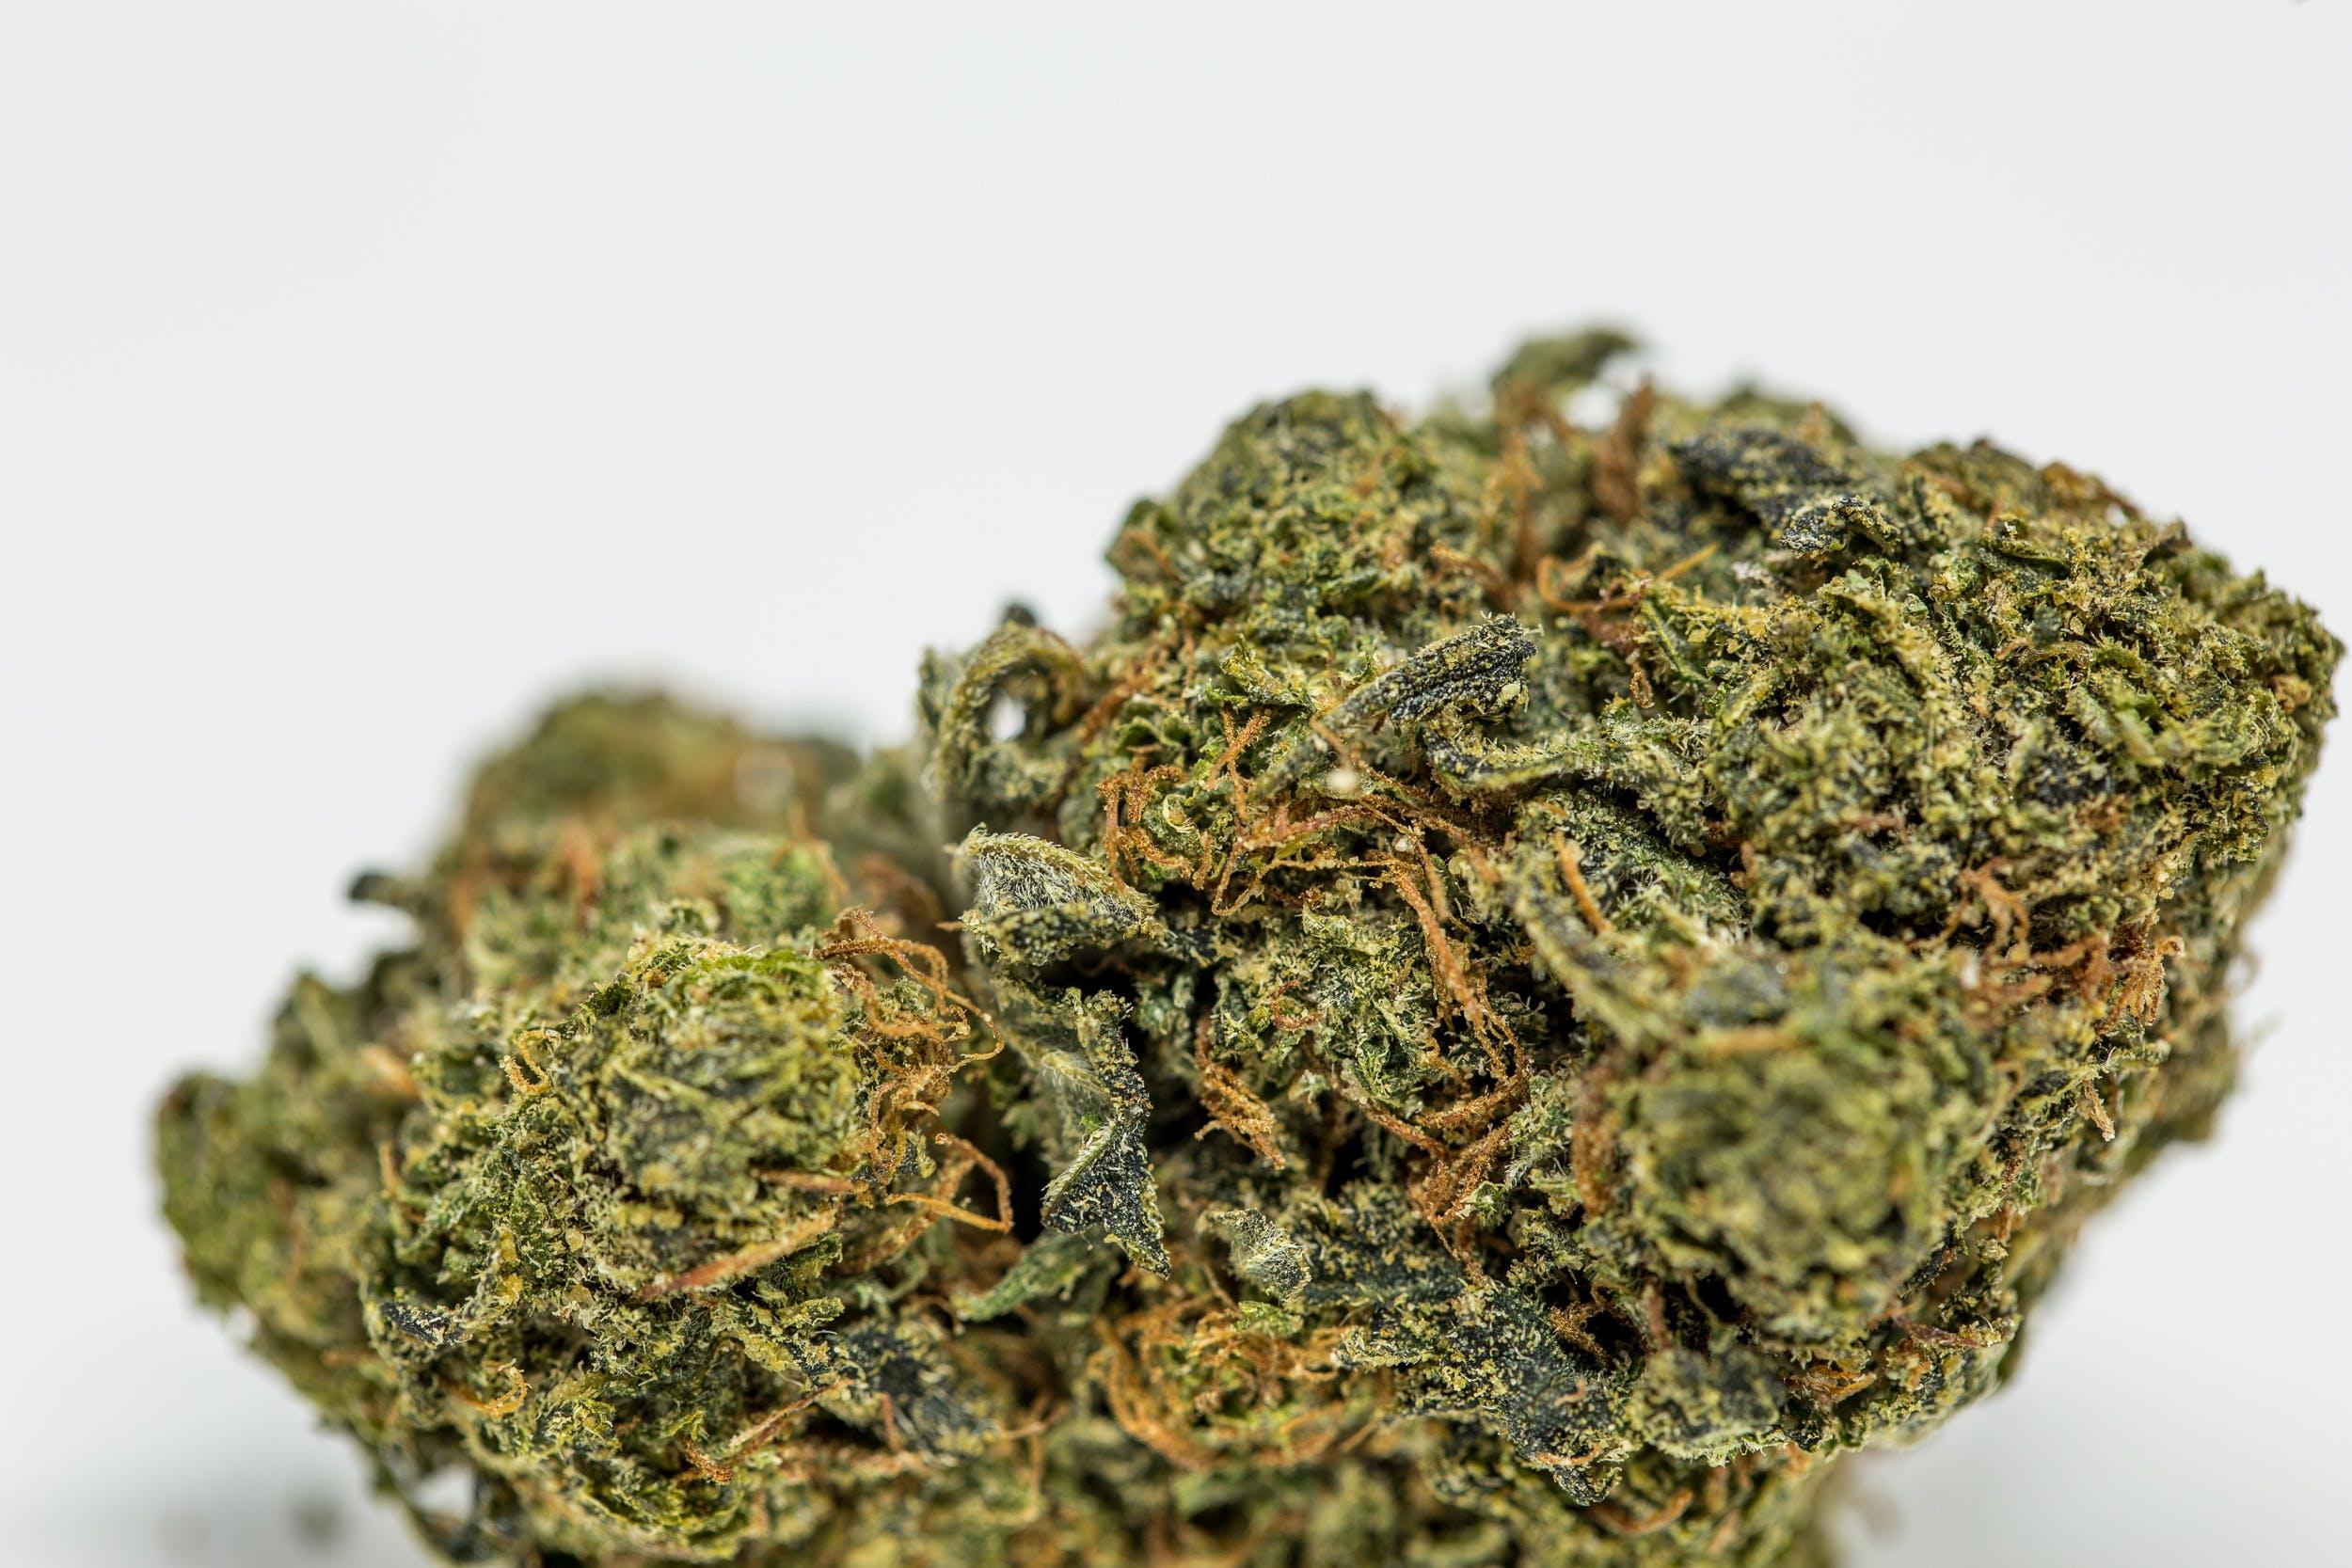 Green Crack 1 5 reasons cops want to legalize recreational marijuana too